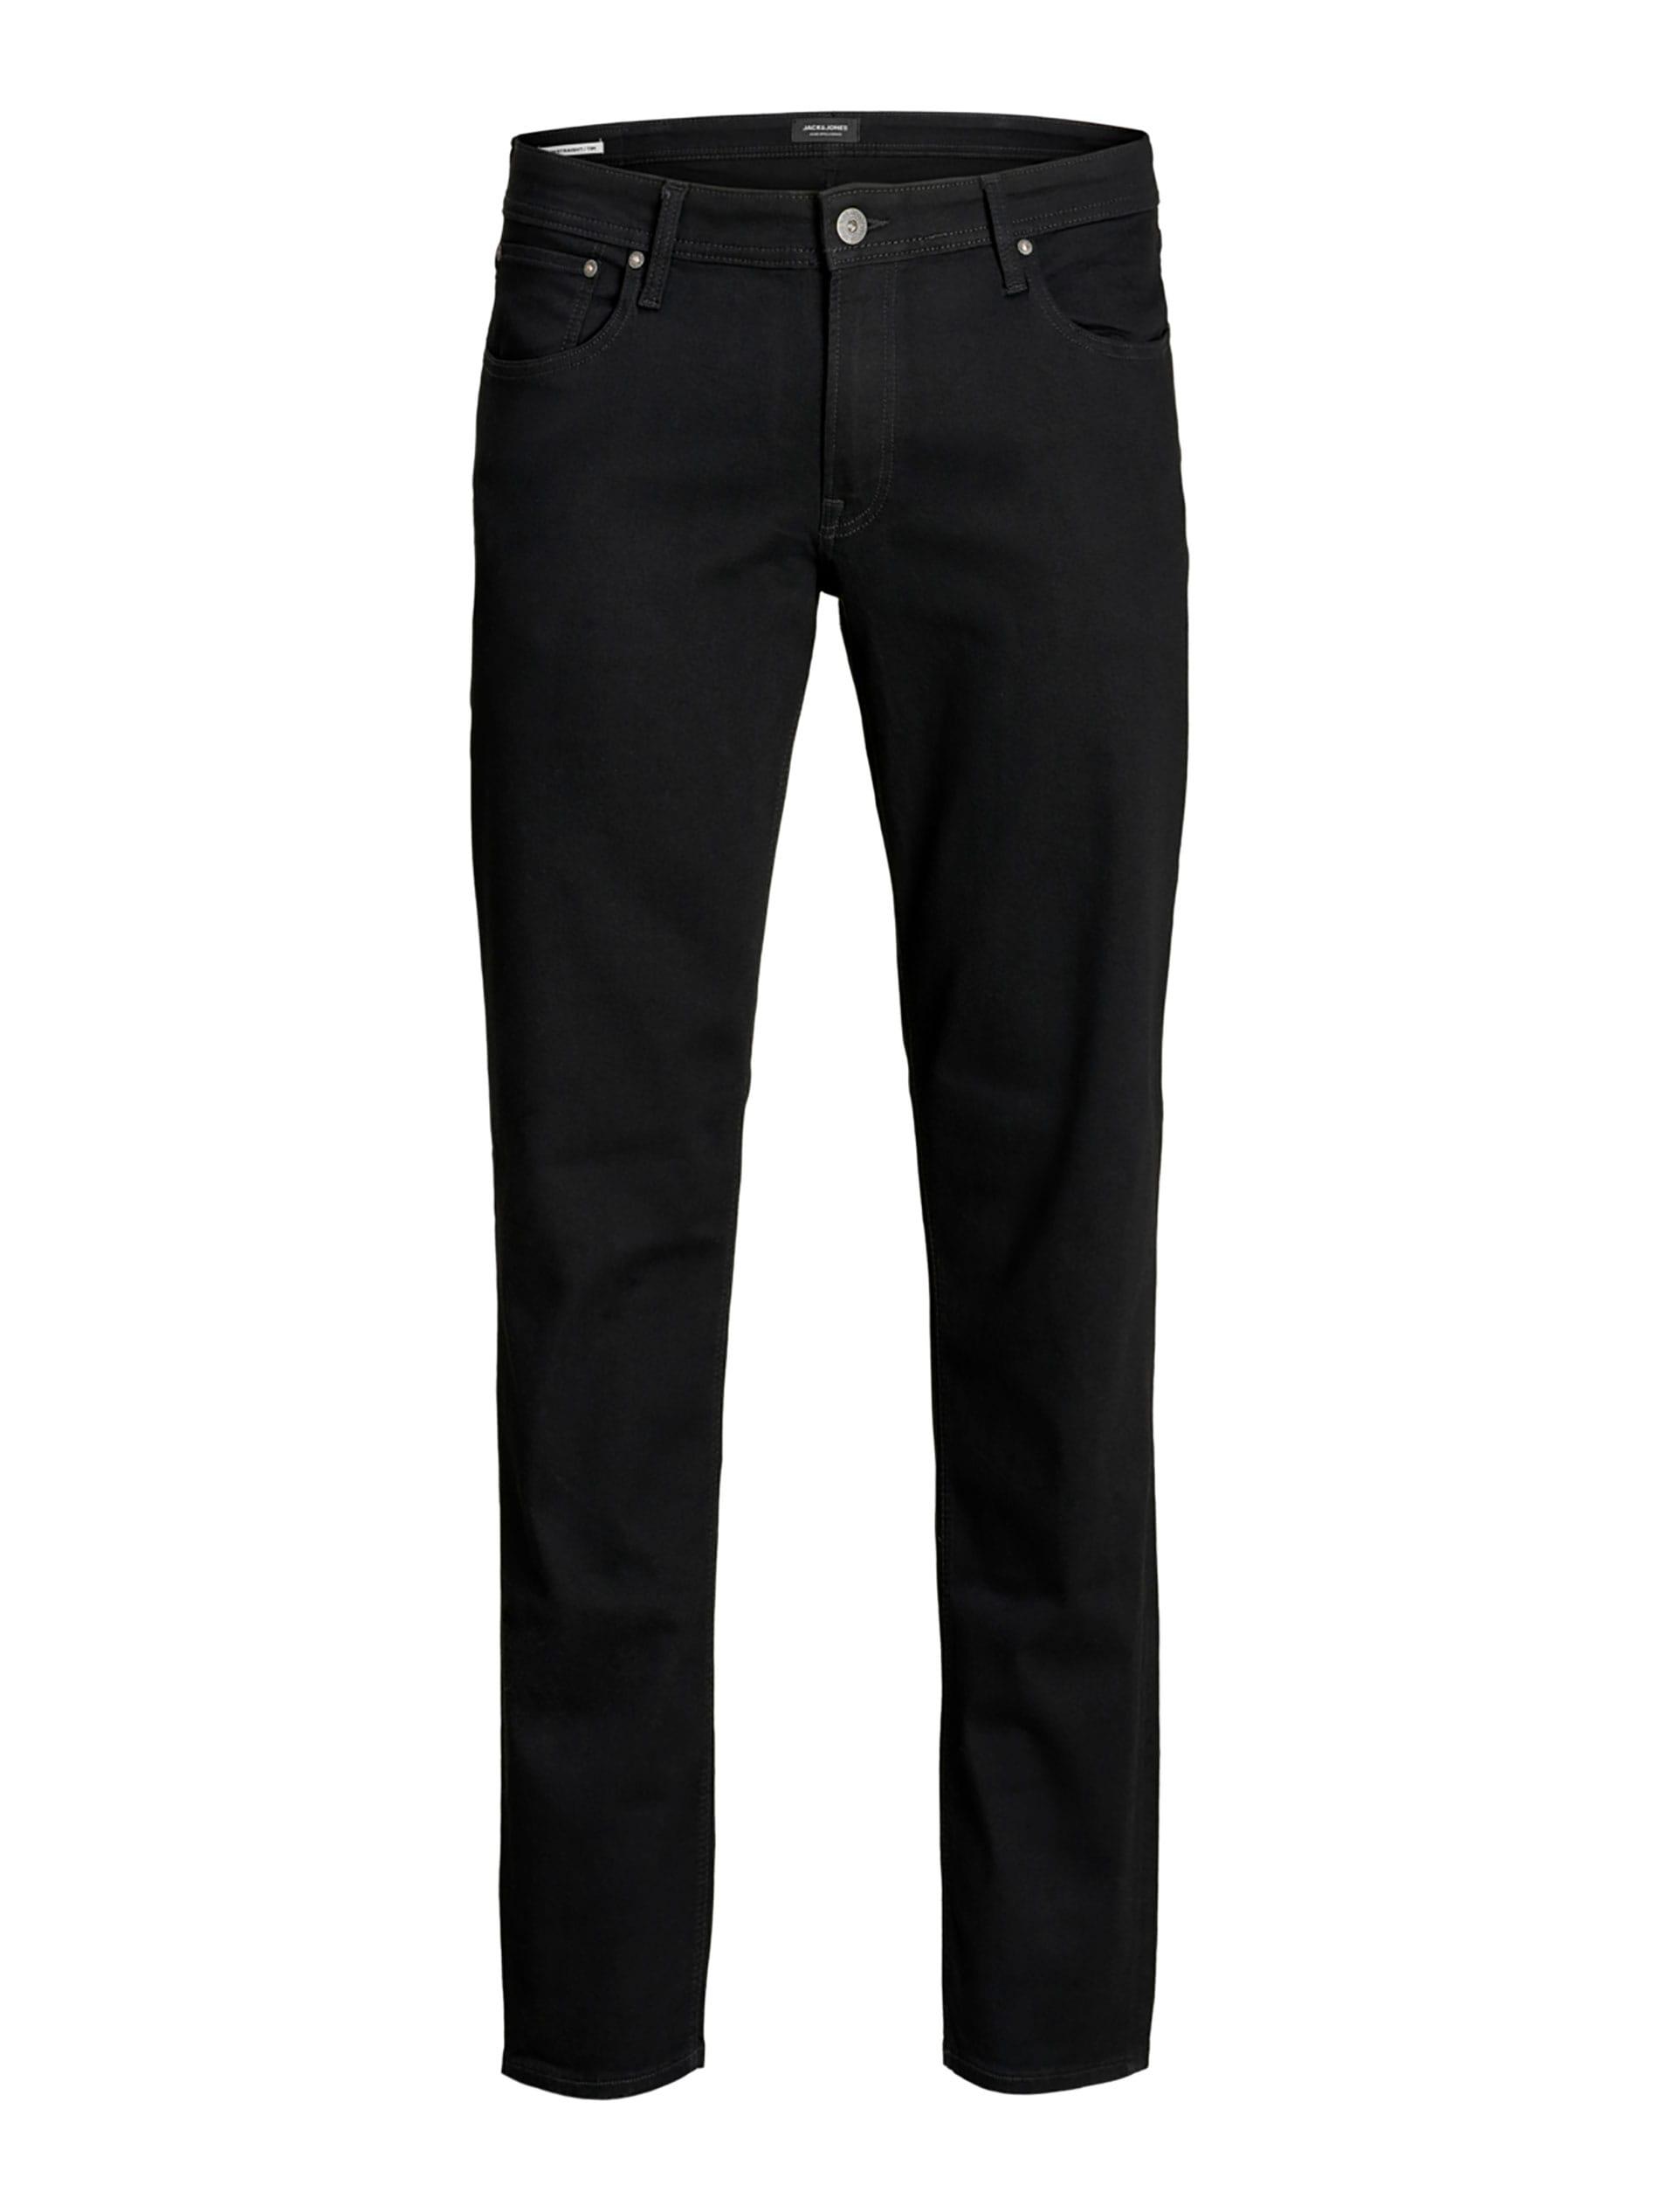 JACK & JONES Black Original Straight Leg Jeans